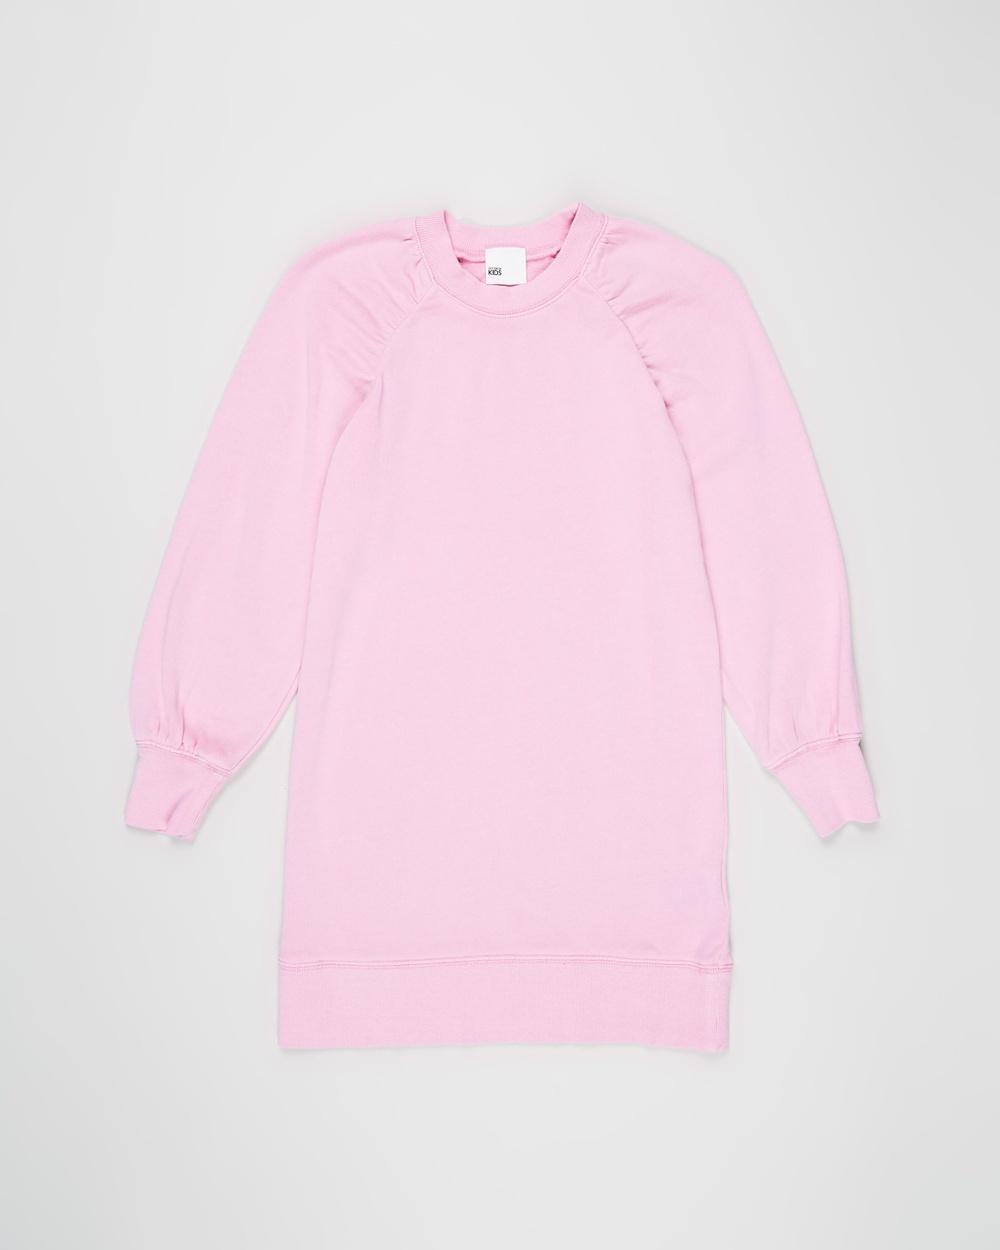 Cotton On Kids Molly Long Sleeve Dress Teens Dresses Pink Gerbera Kids-Teens Australia